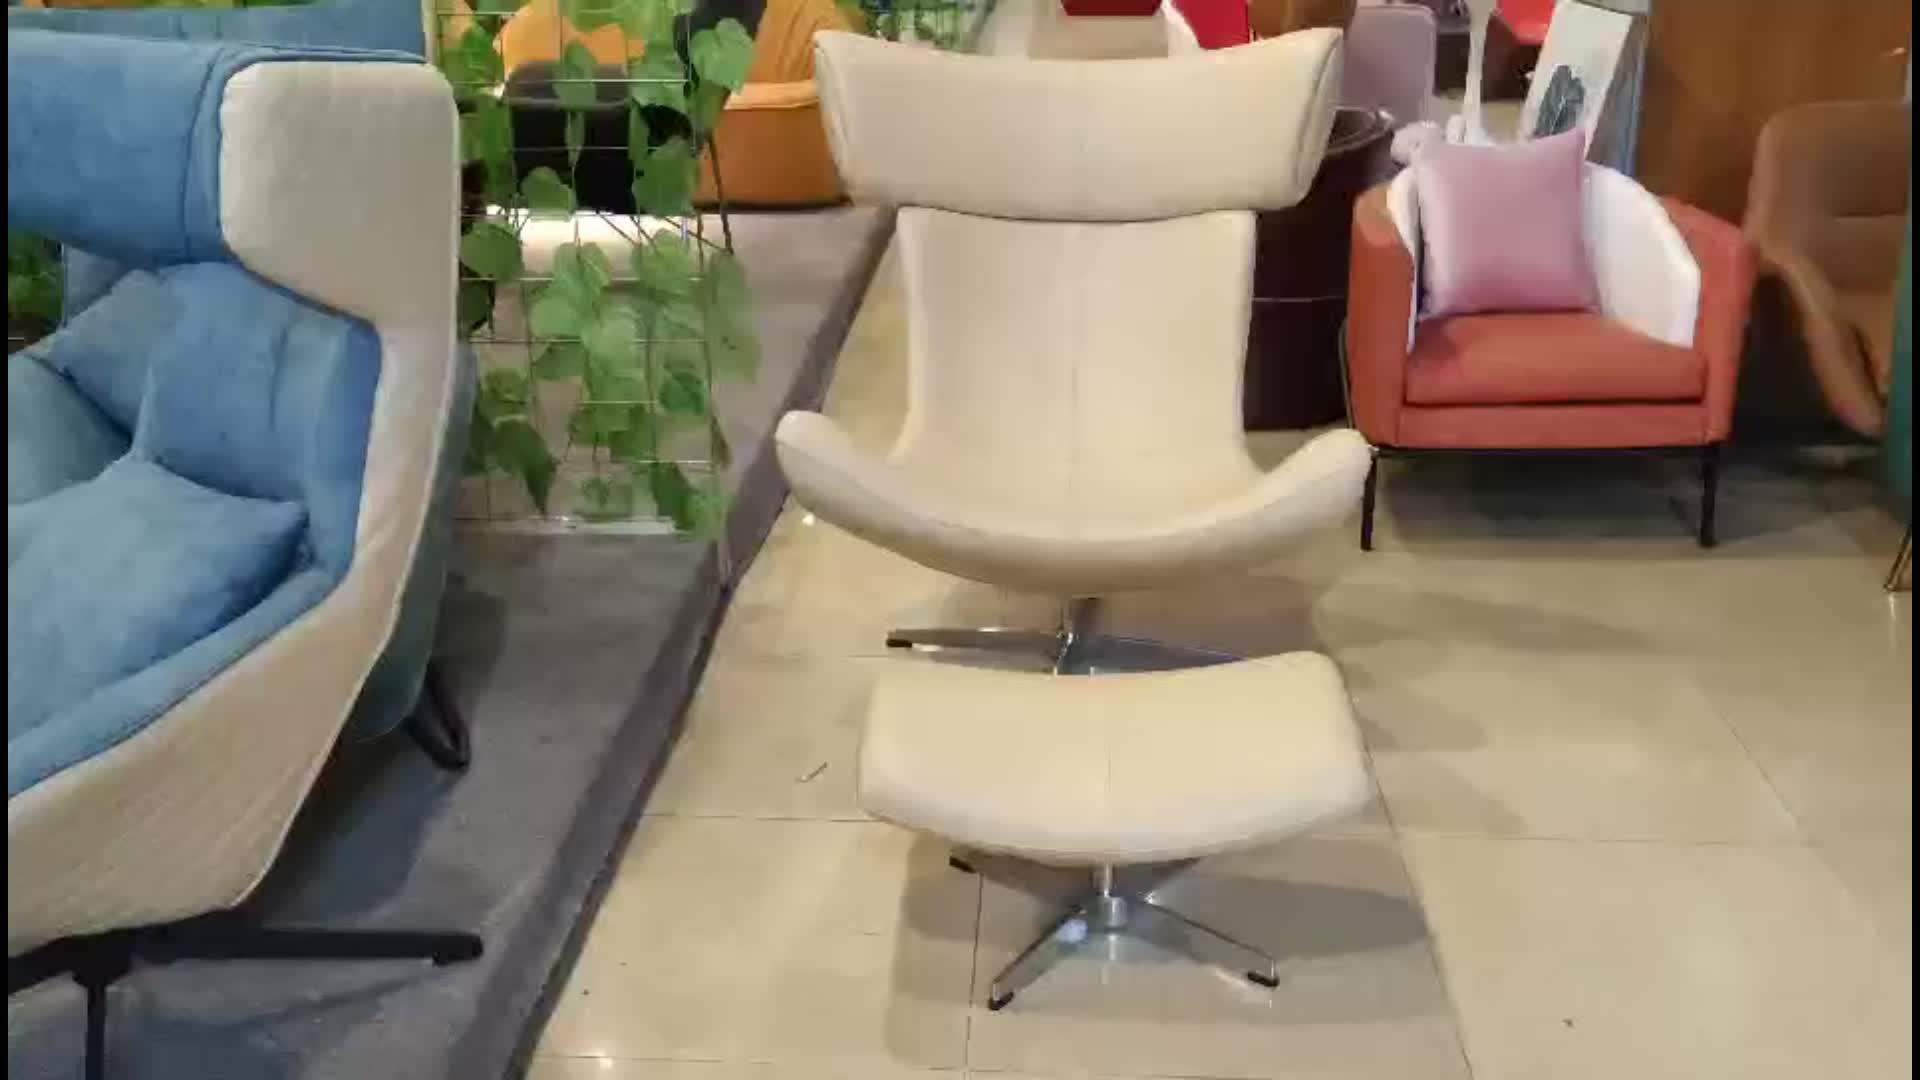 Estilo nórdico de sala de muebles para el hogar de cuero solo imola chaise Lounge silla sofá Silla de ocio